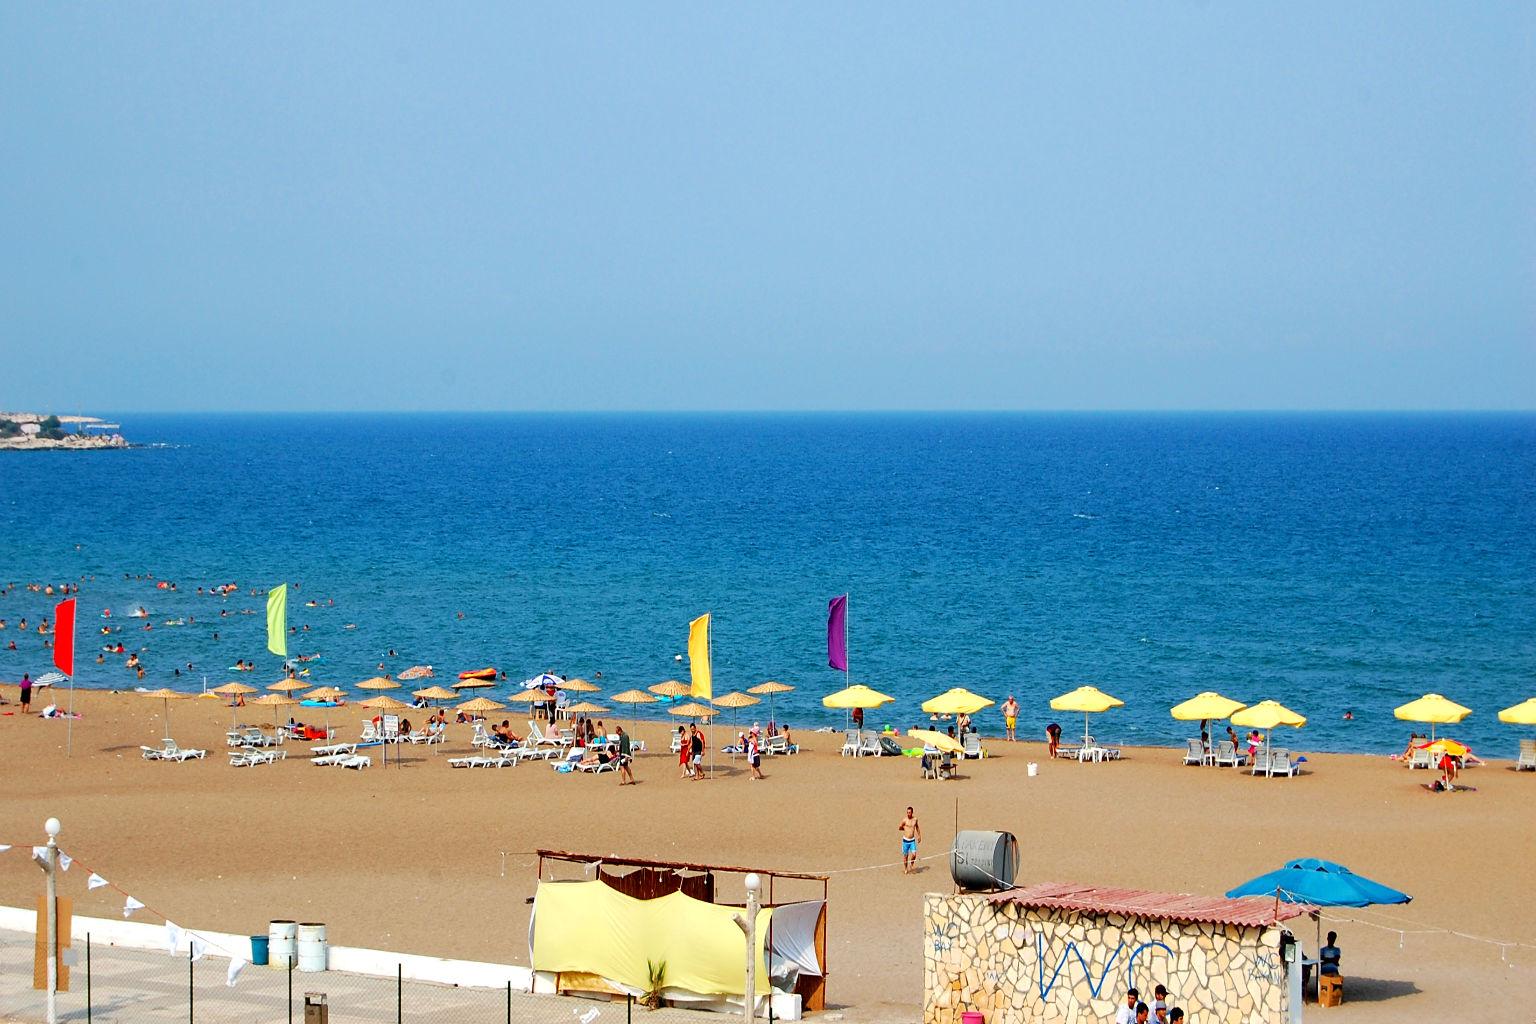 İyonya Denizi. Akdenizin Tatil Köyleri